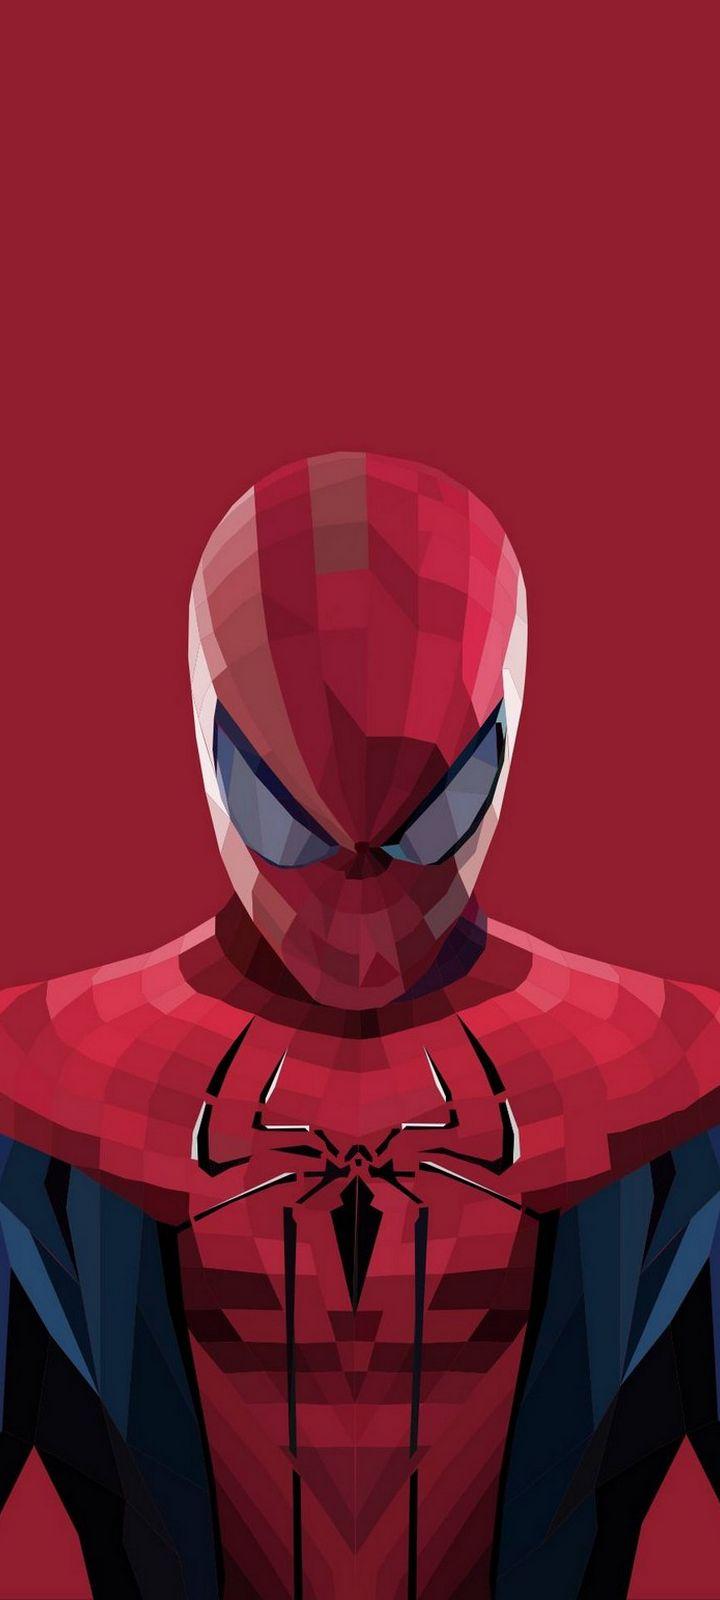 Superhero Spiderman Cartoon Wallpaper - Iphone Spiderman Wallpaper Hd - HD Wallpaper